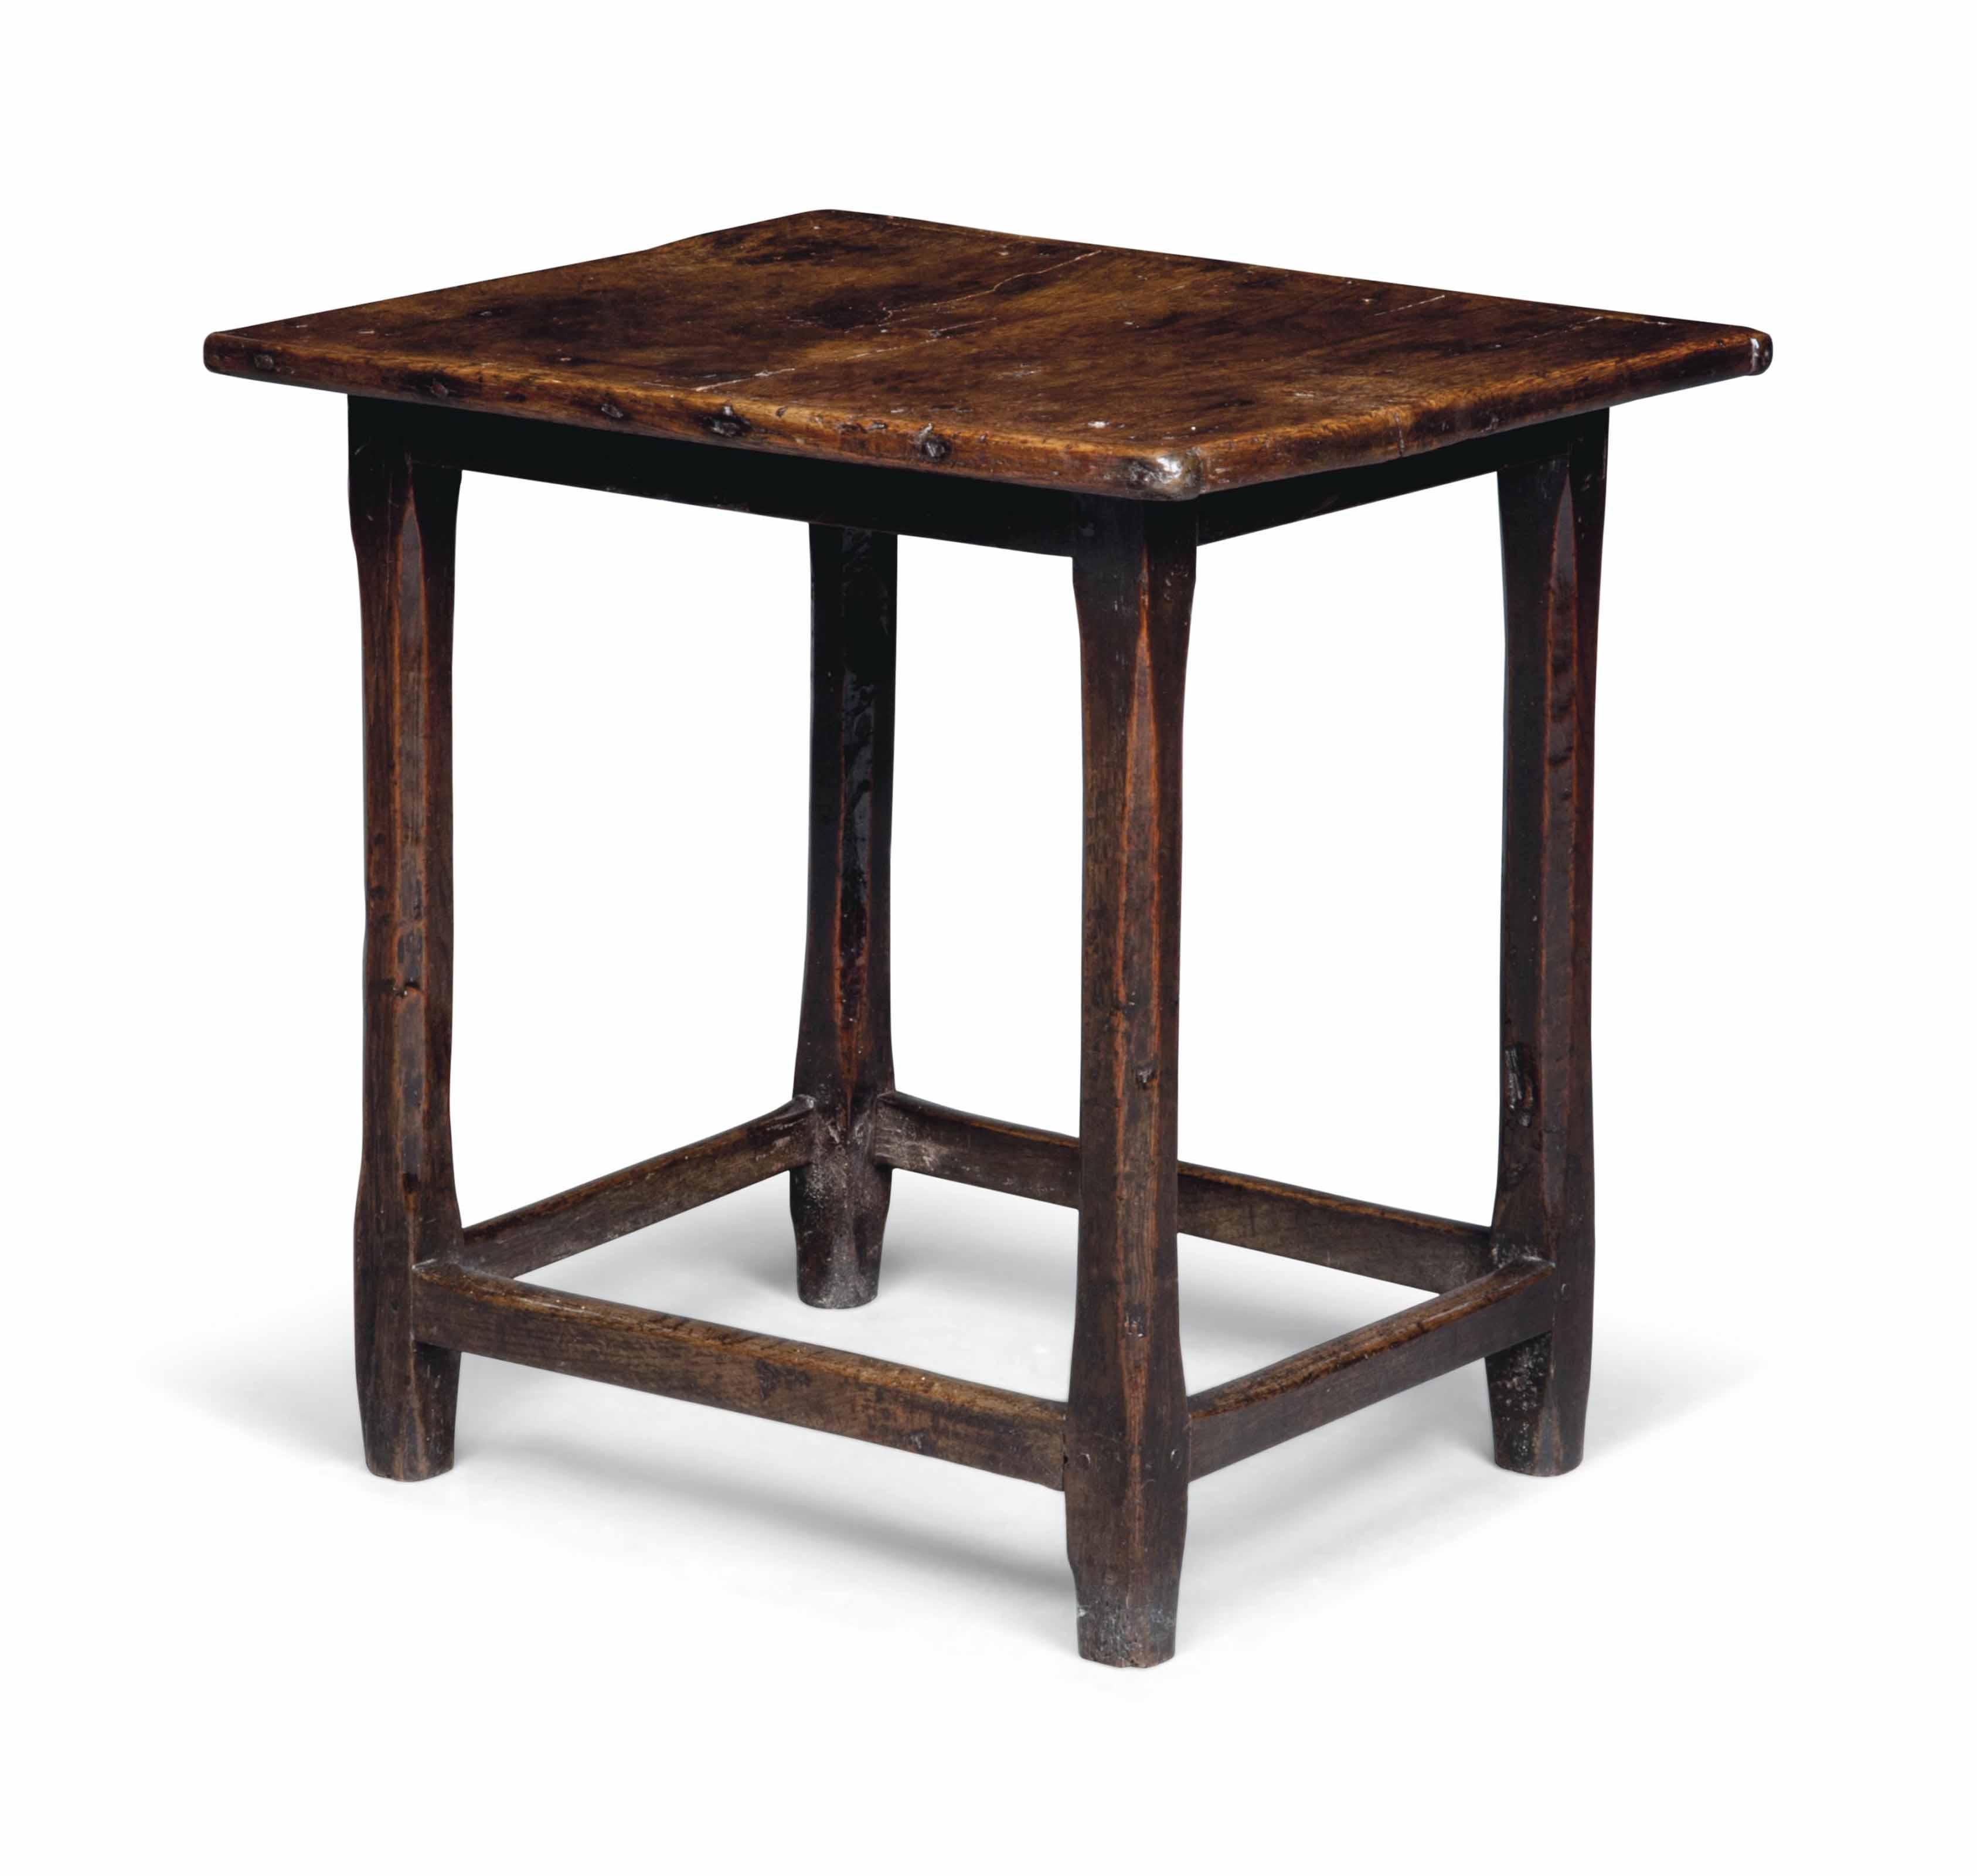 A SMALL OAK TABLE